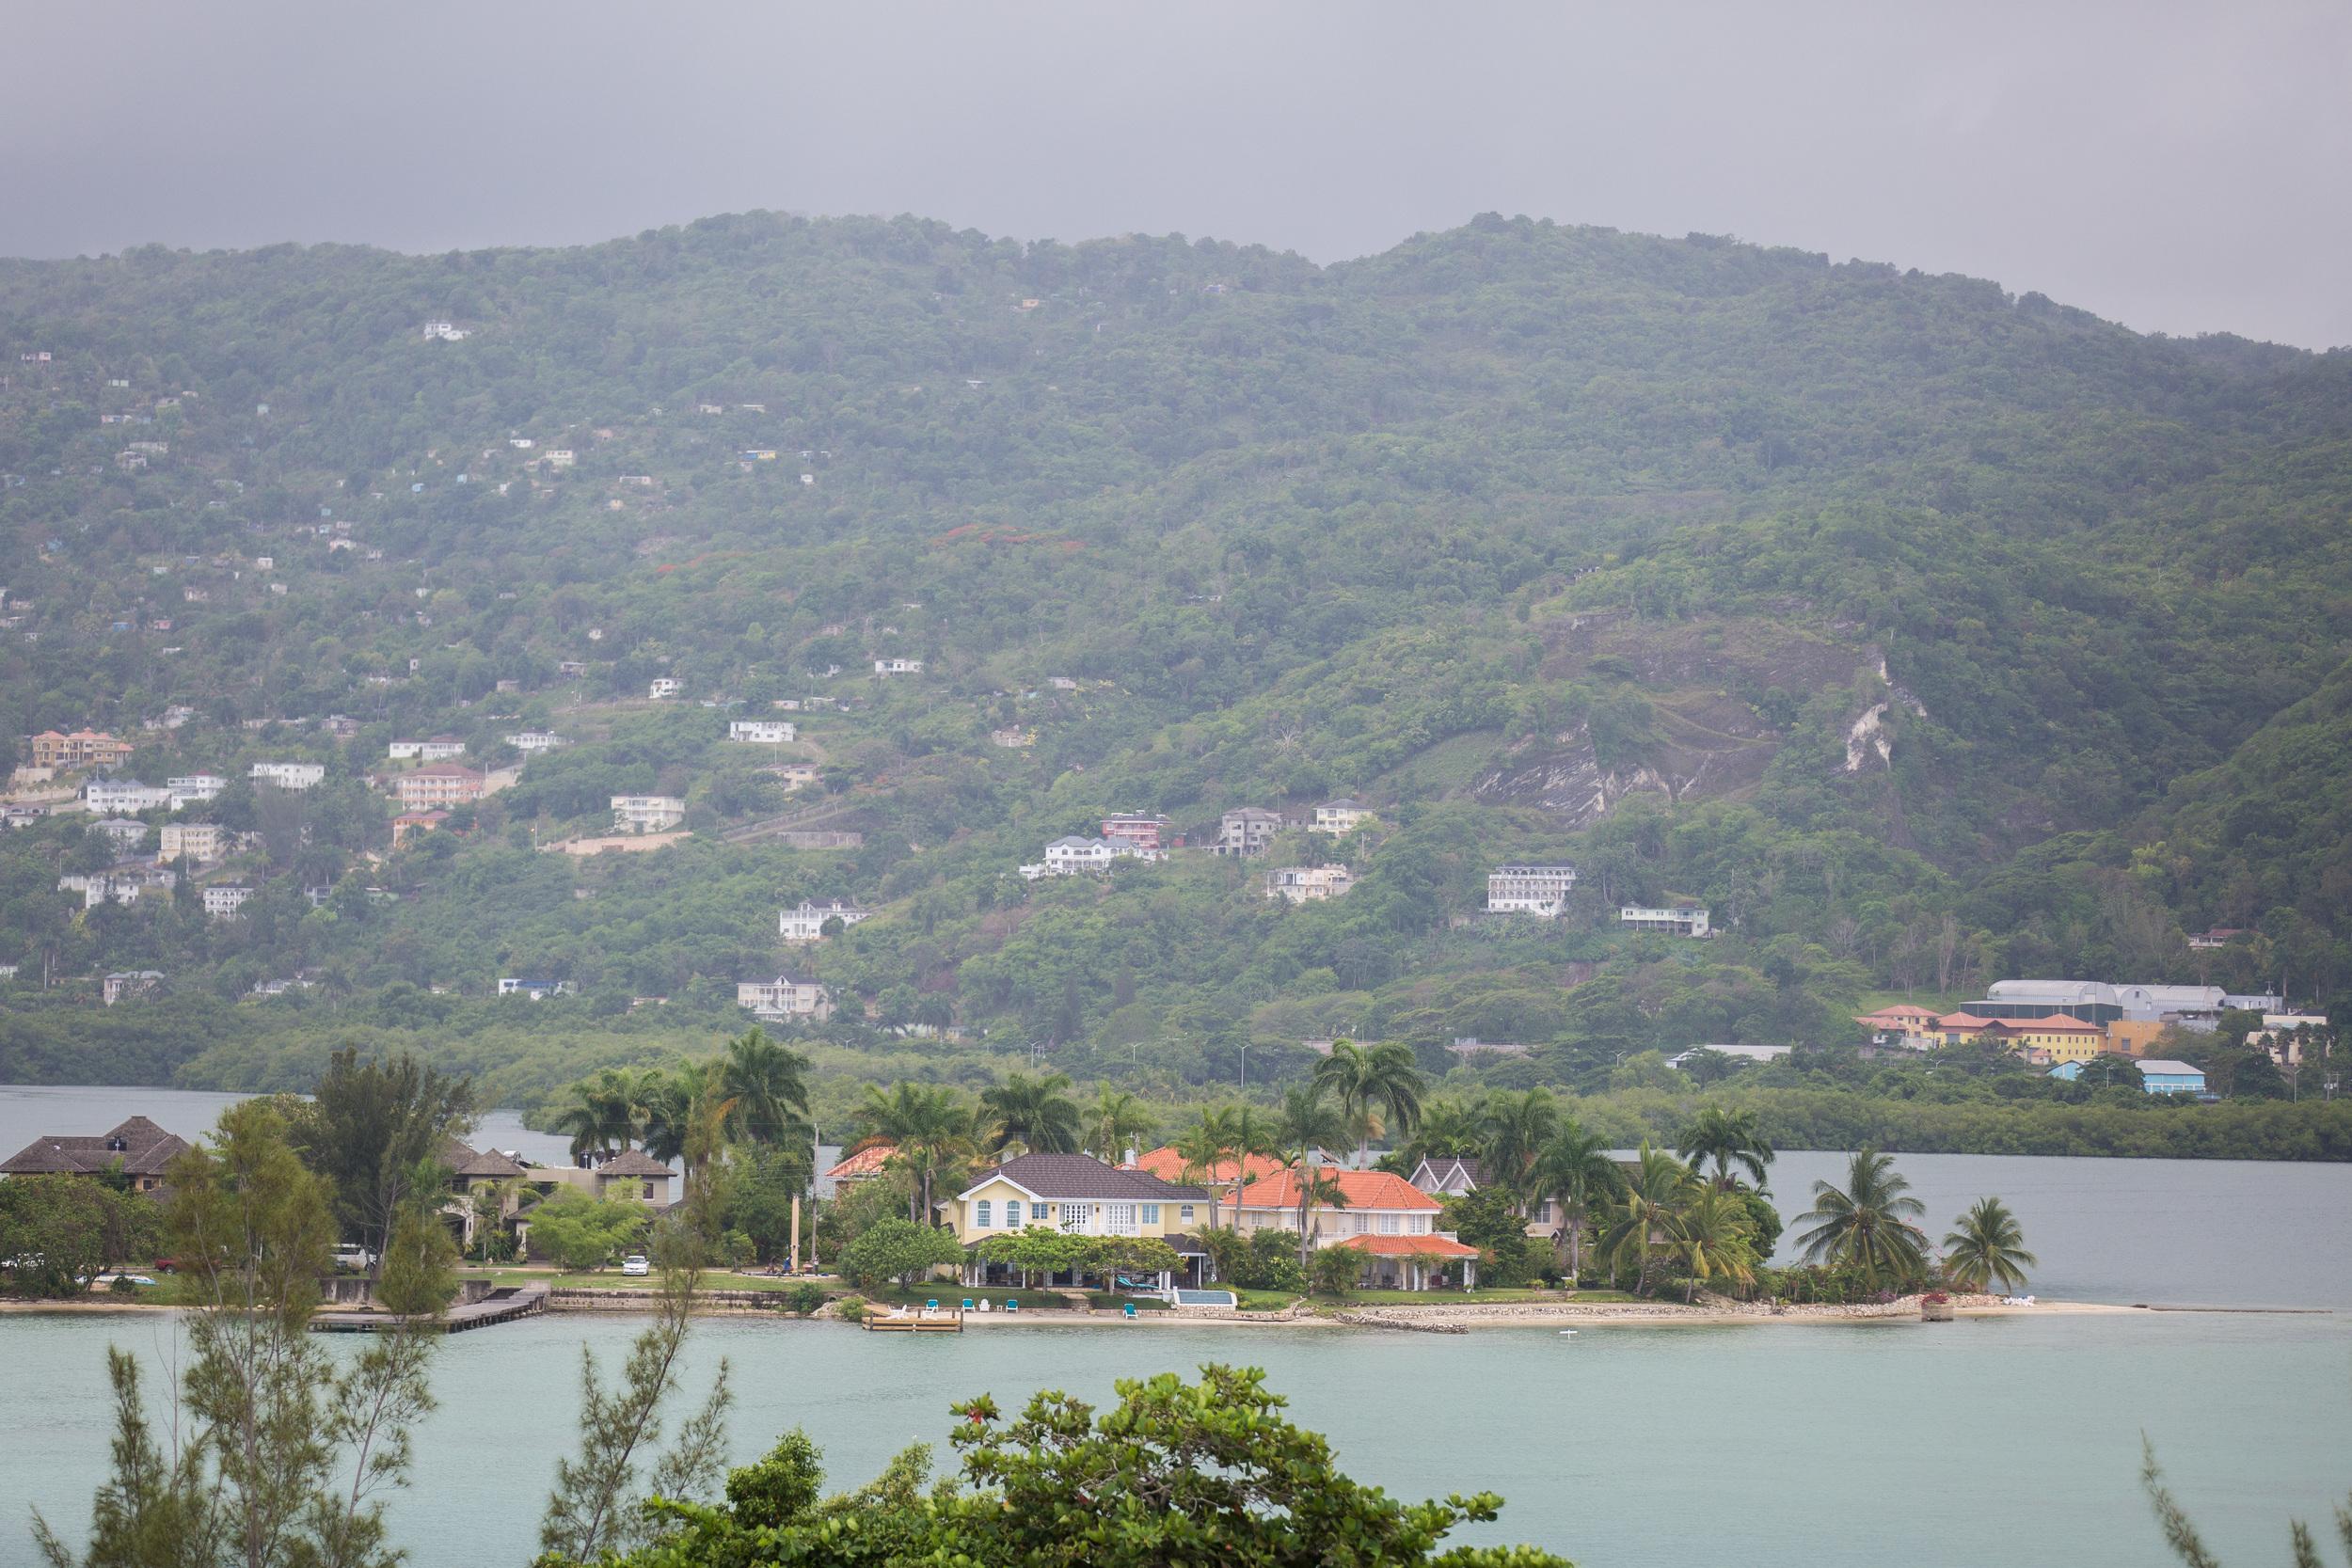 jamaicawedding2014 (32 of 146).jpg